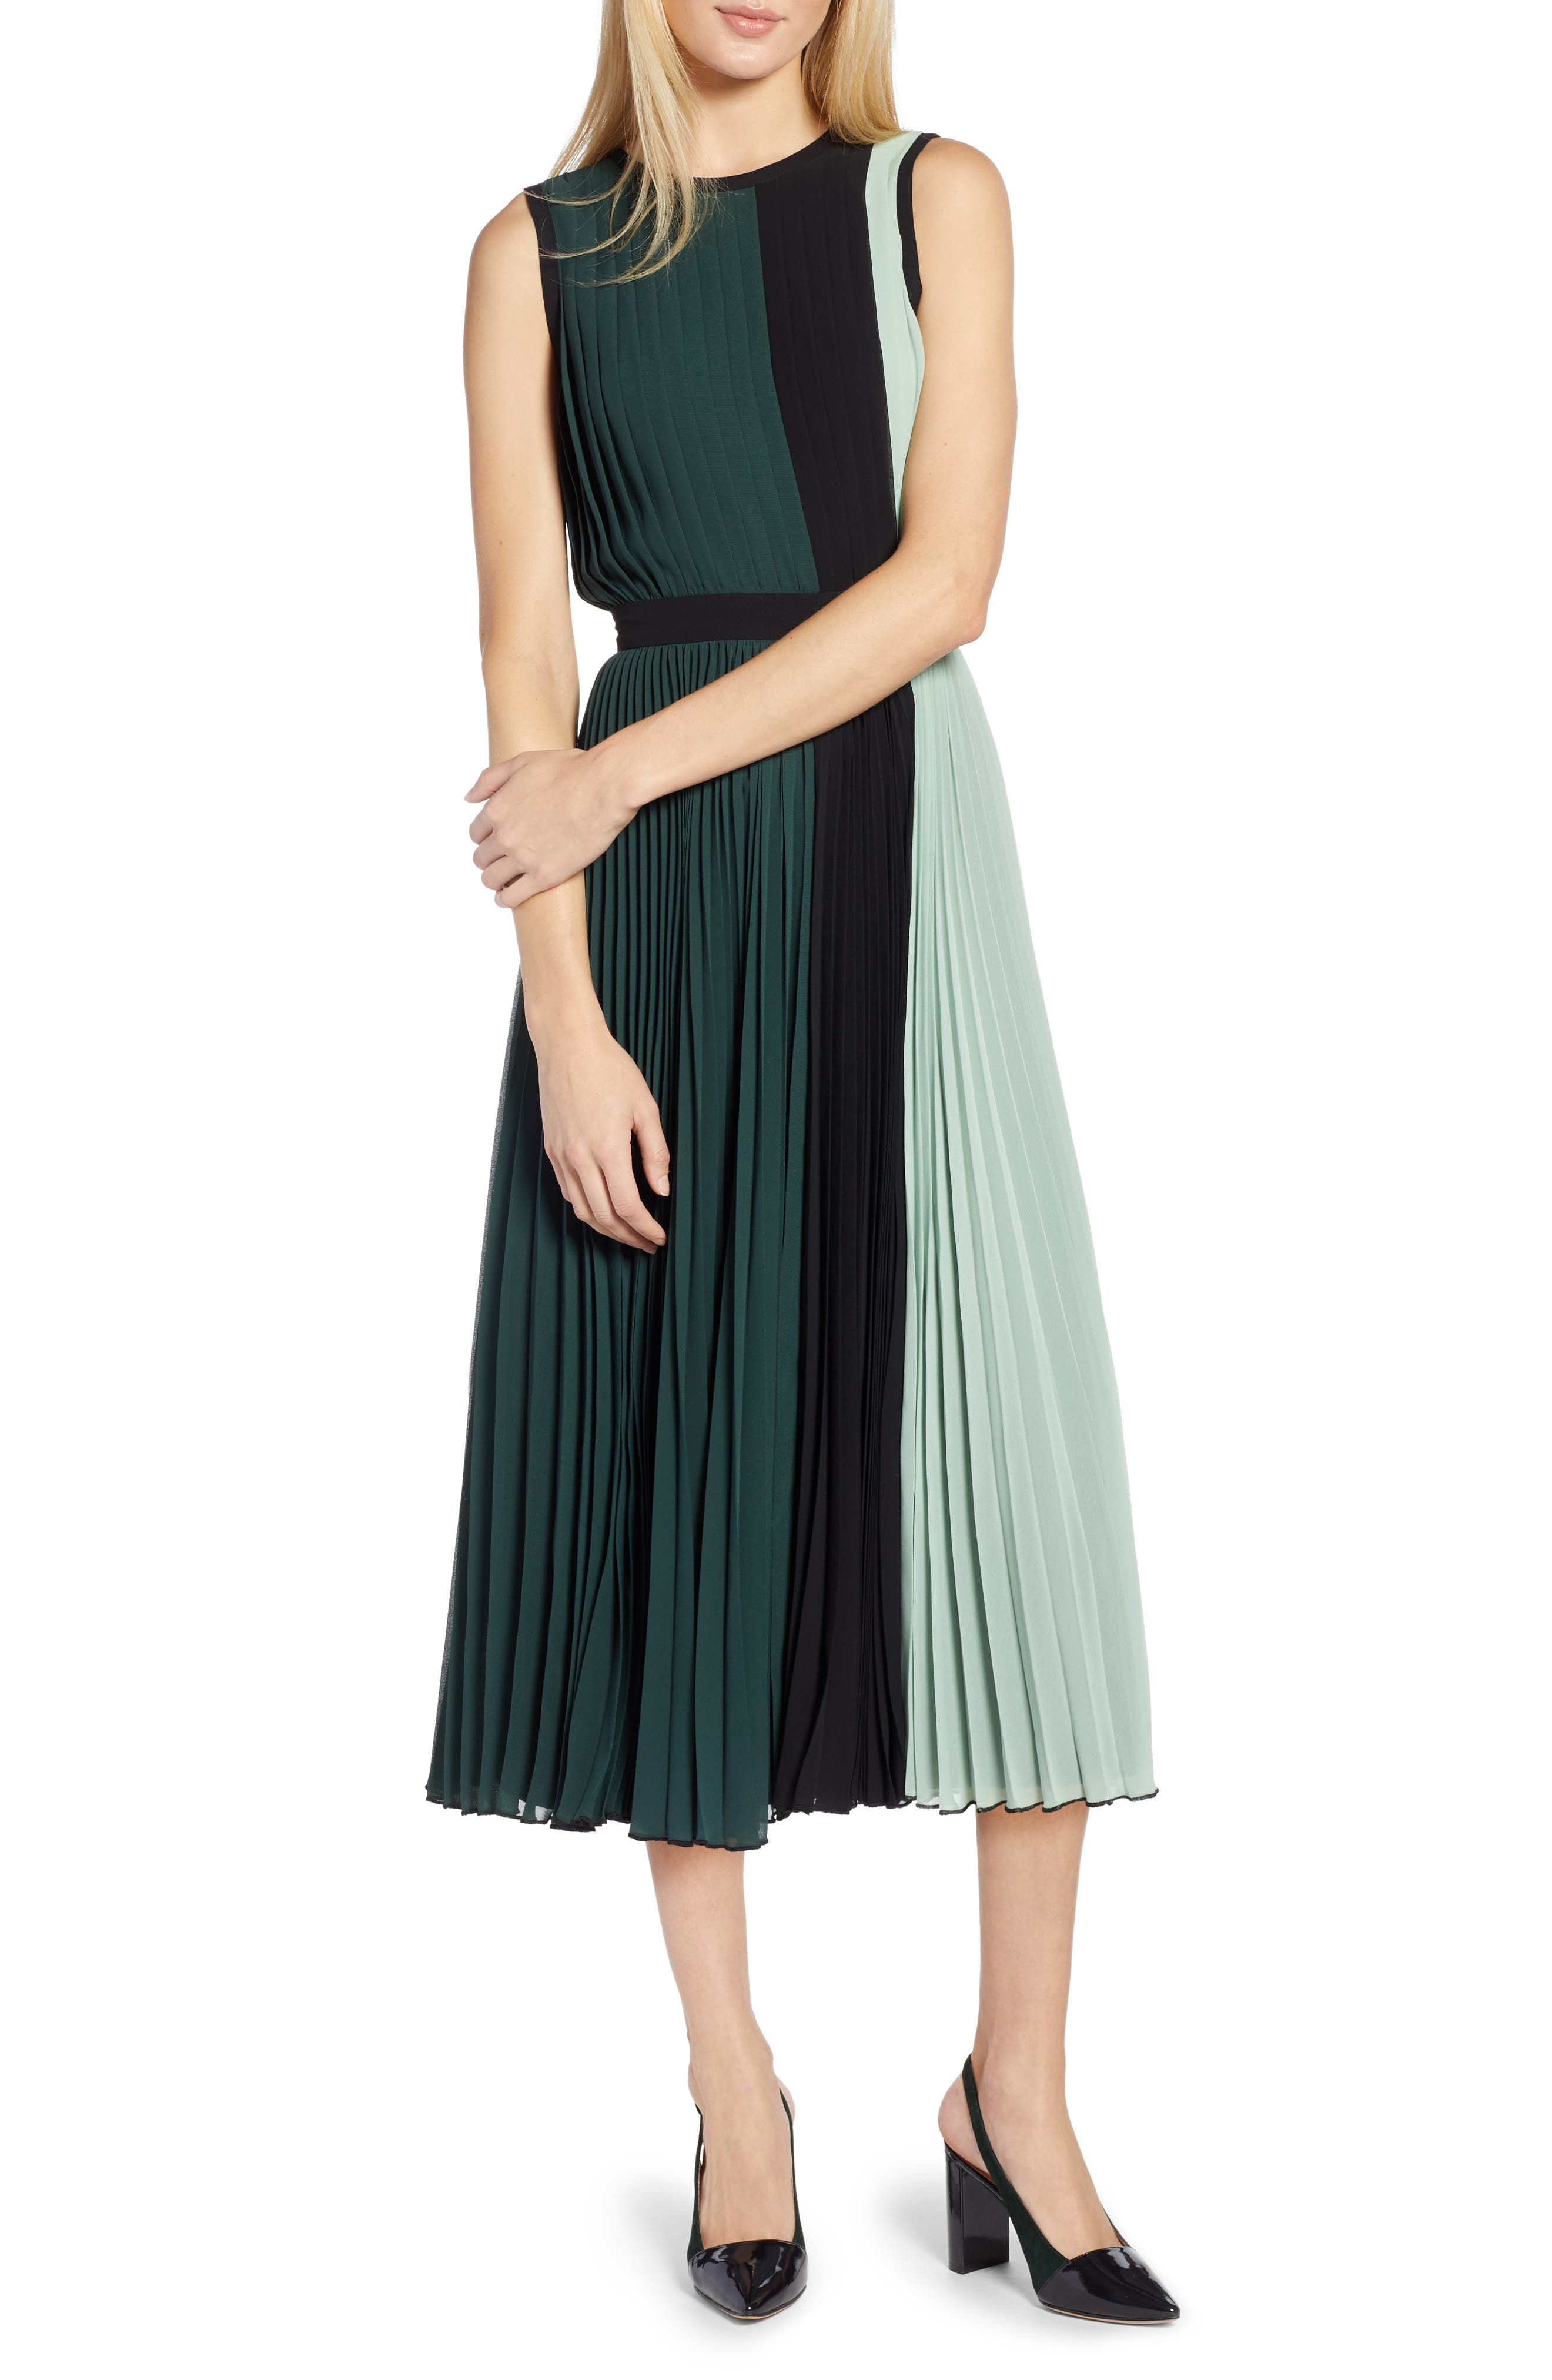 Halogen X Atlantic-Pacific Colorblock Pleated Midi Dress